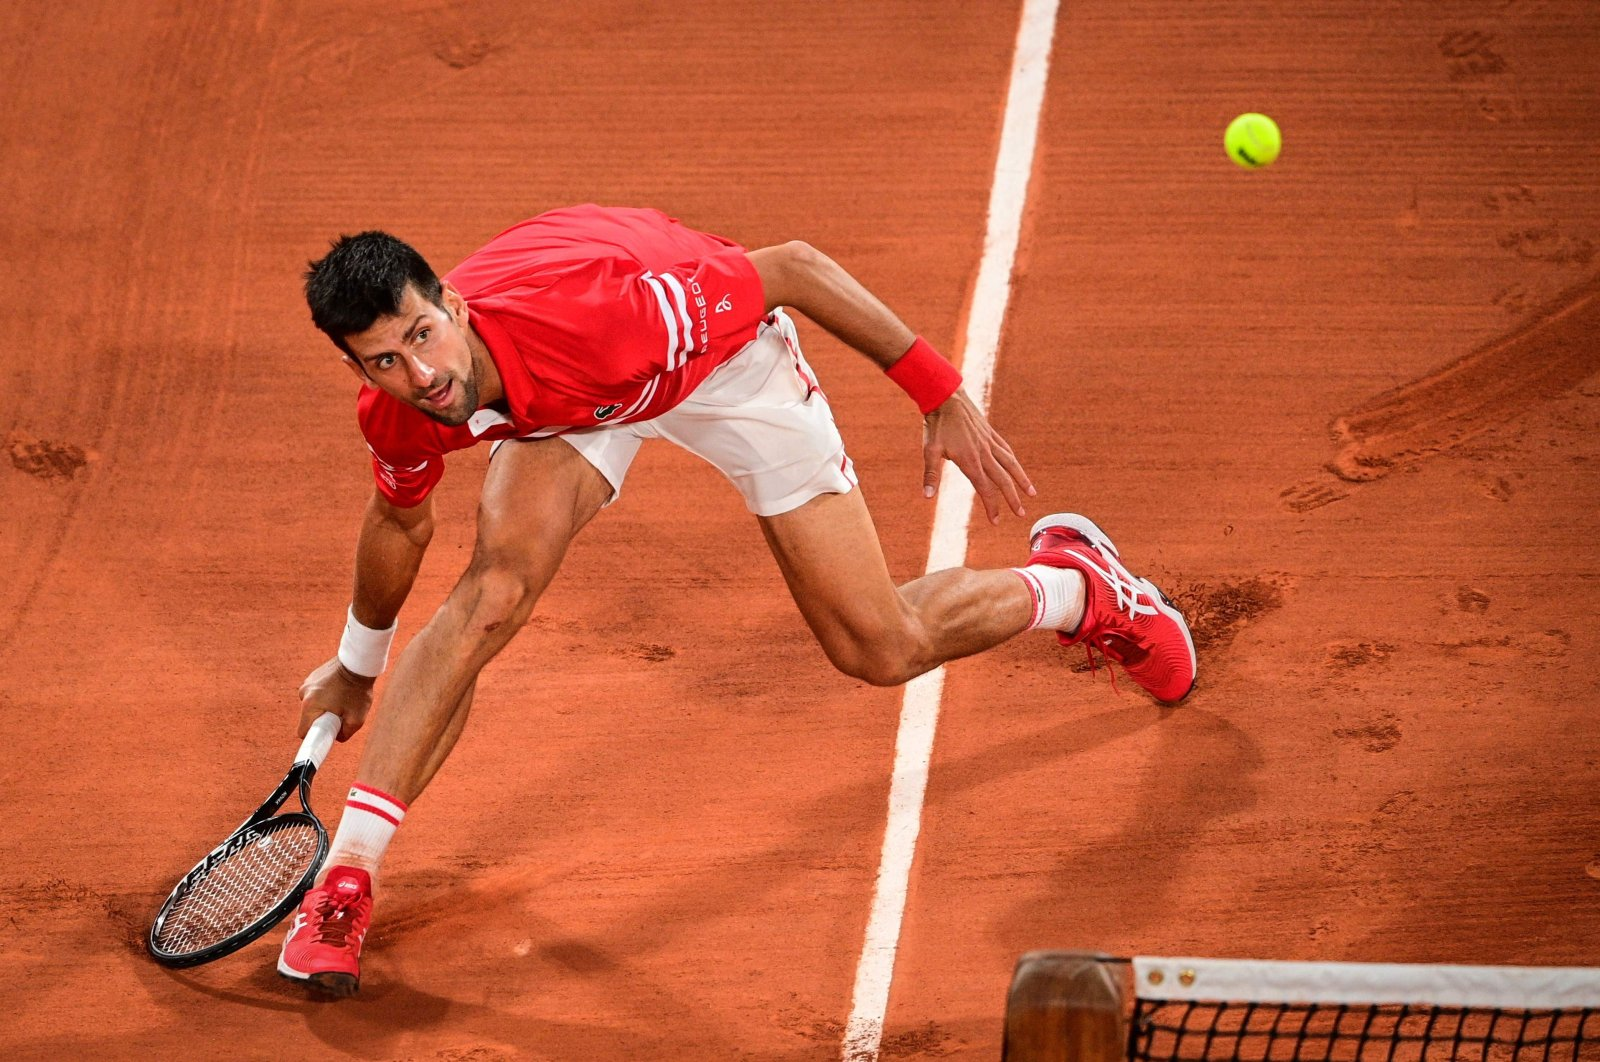 Serbia's Novak Djokovic eyes the ball as he returns it to Italy's Matteo Berrettini during their men's singles French Open quarterfinal match, Paris, France, June 9, 2021. (AFP Photo)